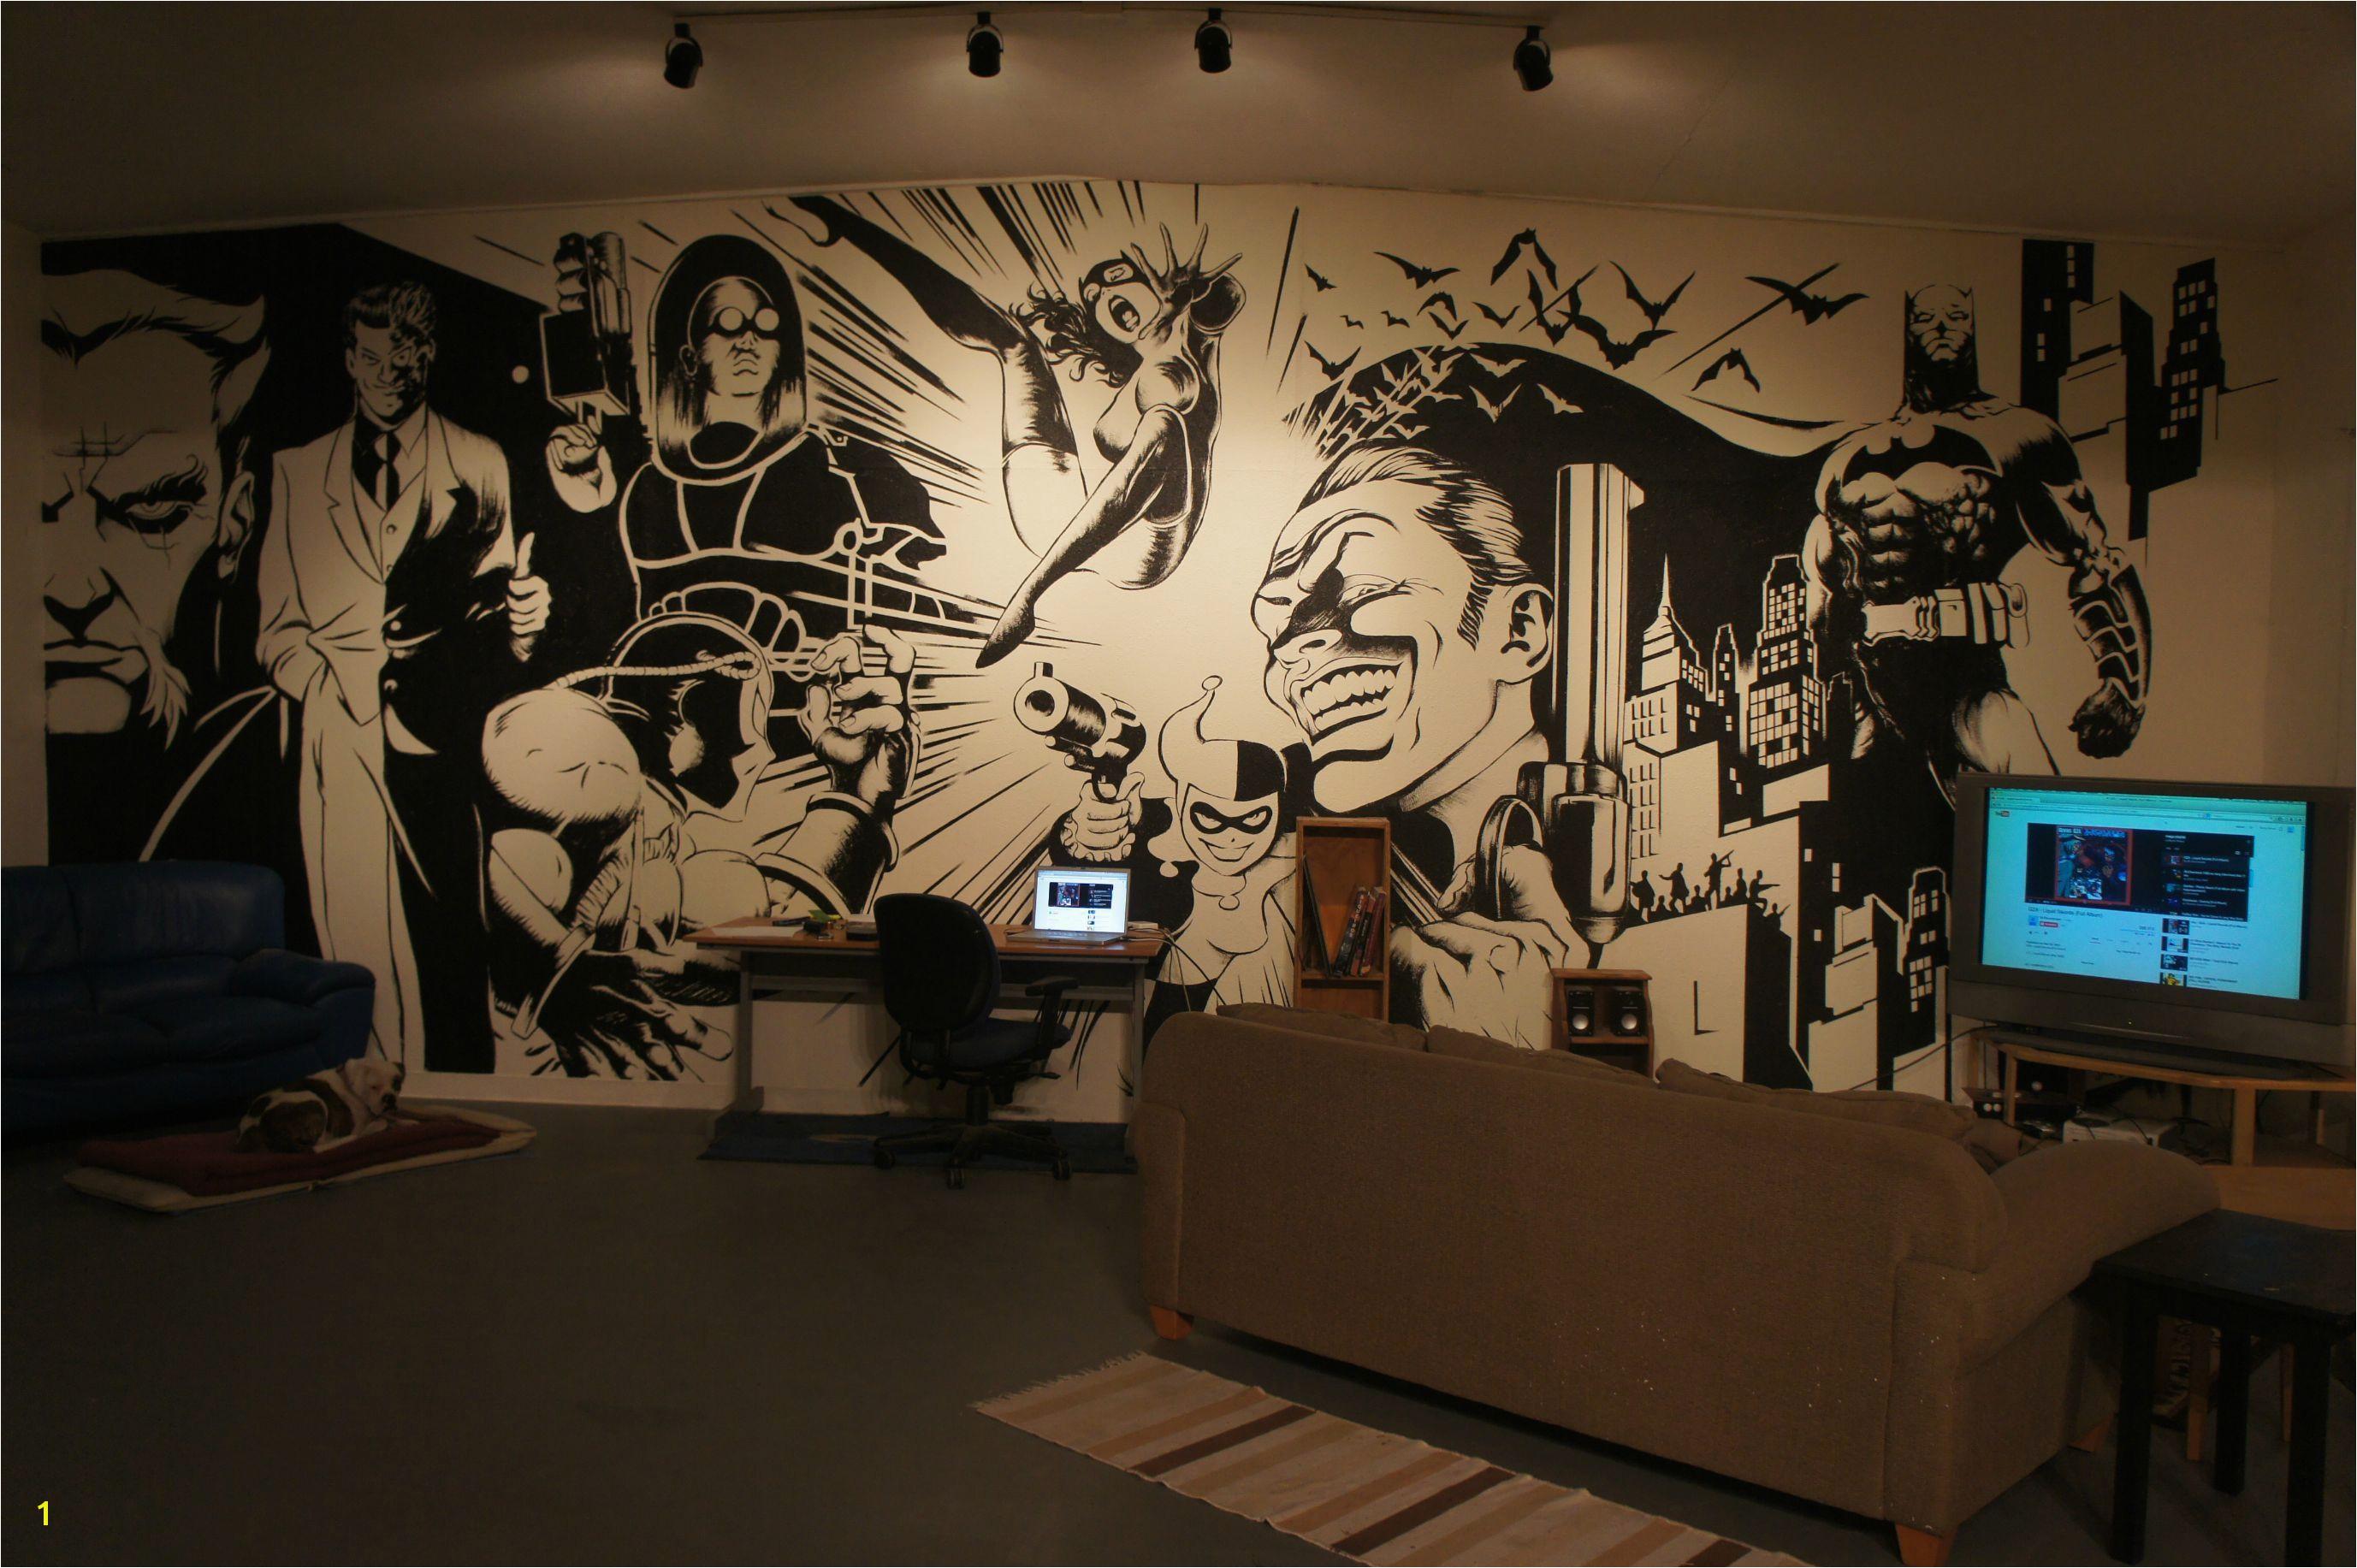 Batman Wall Mural Art